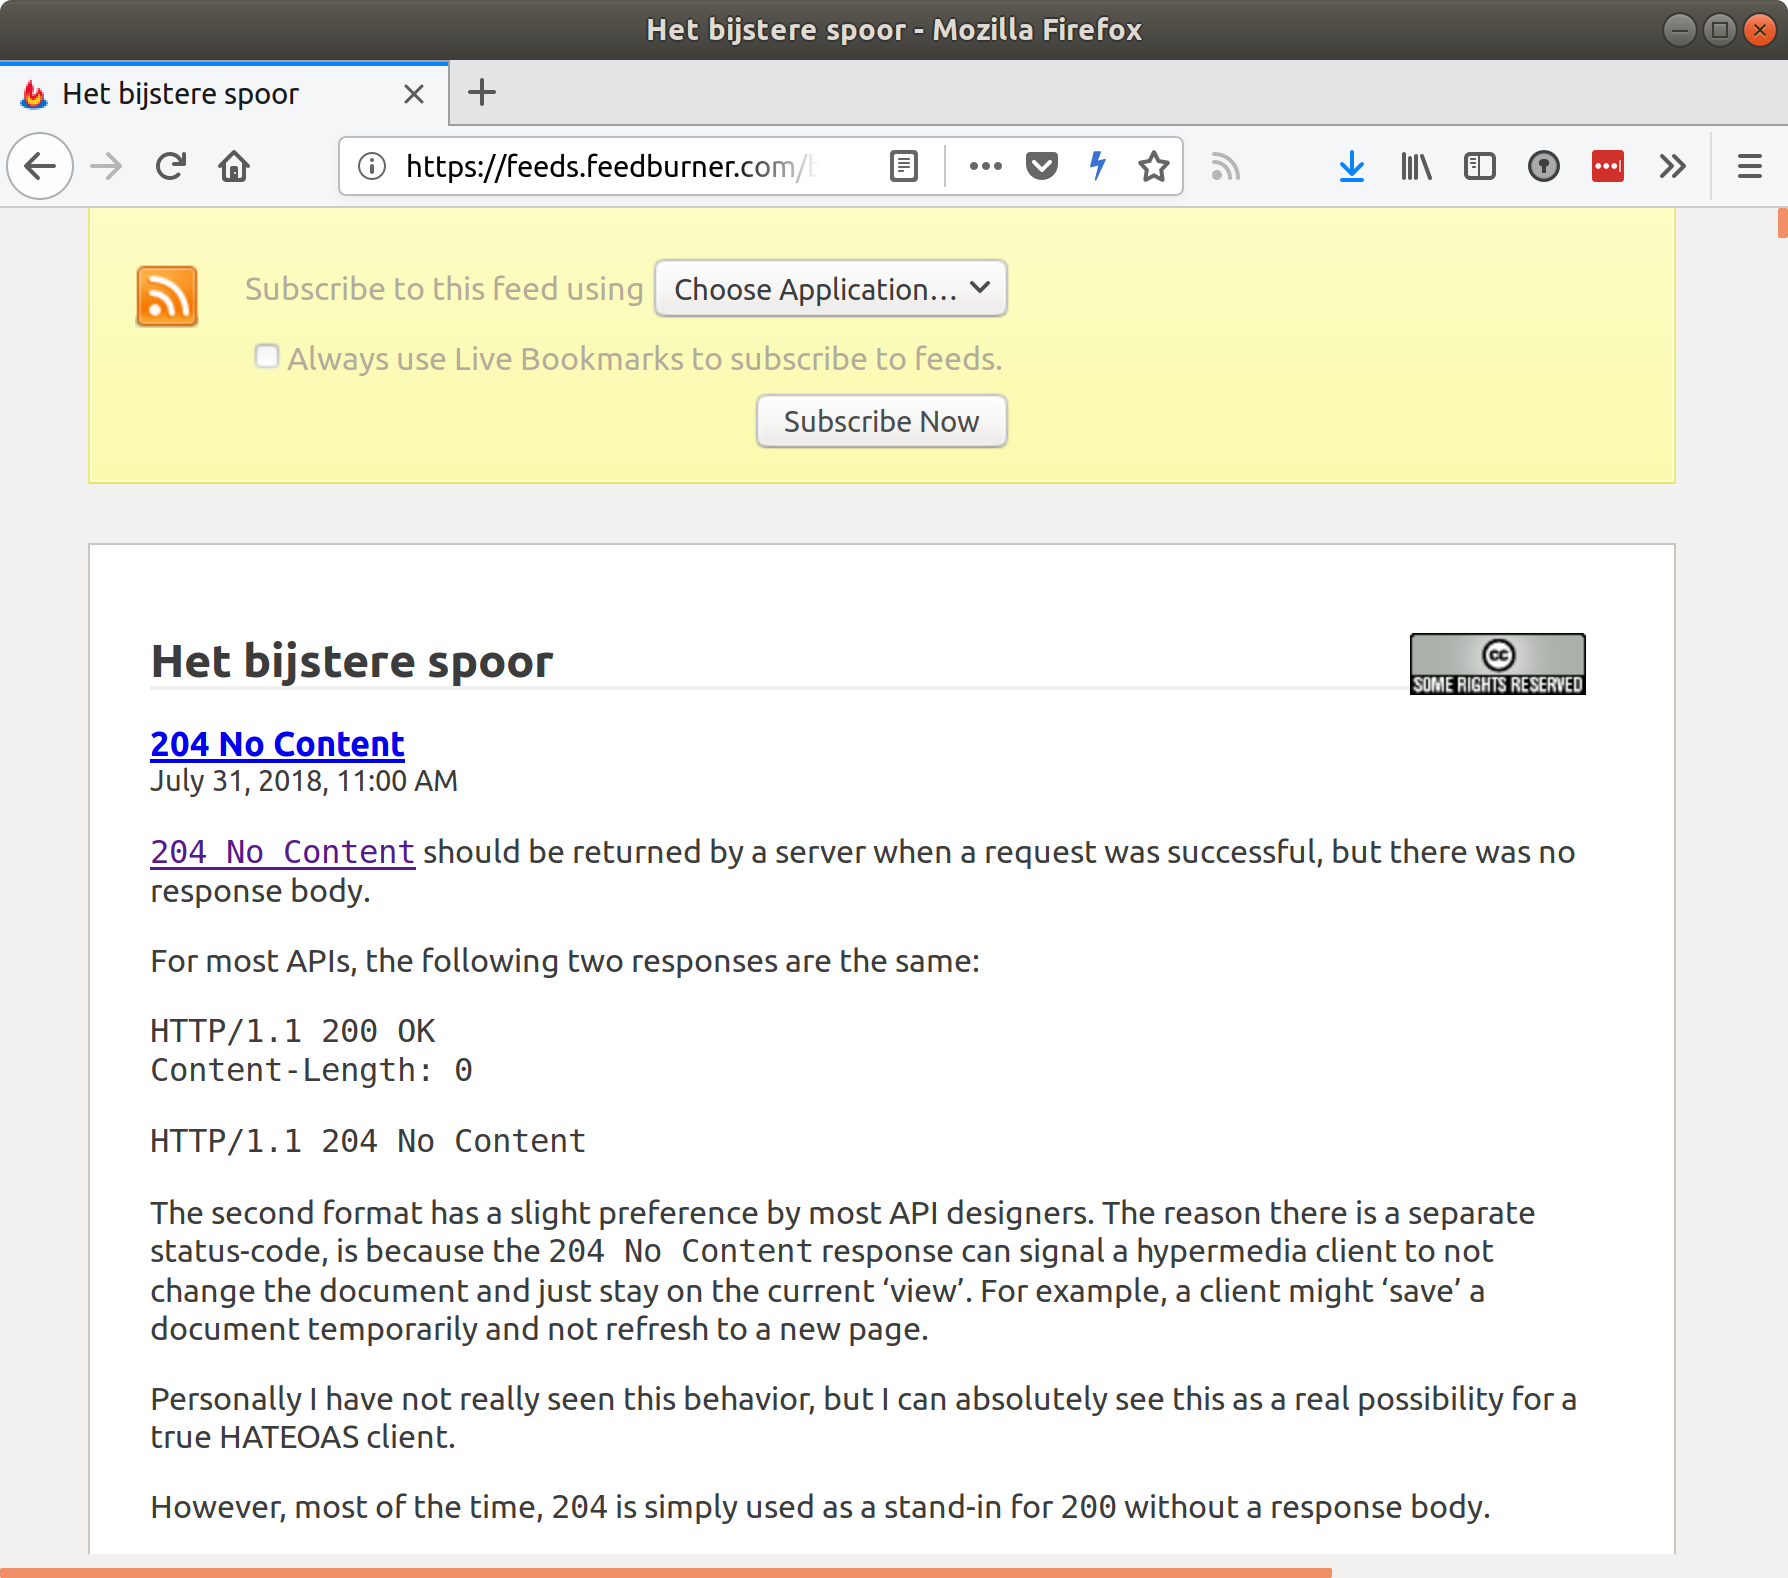 Firefox feed reader